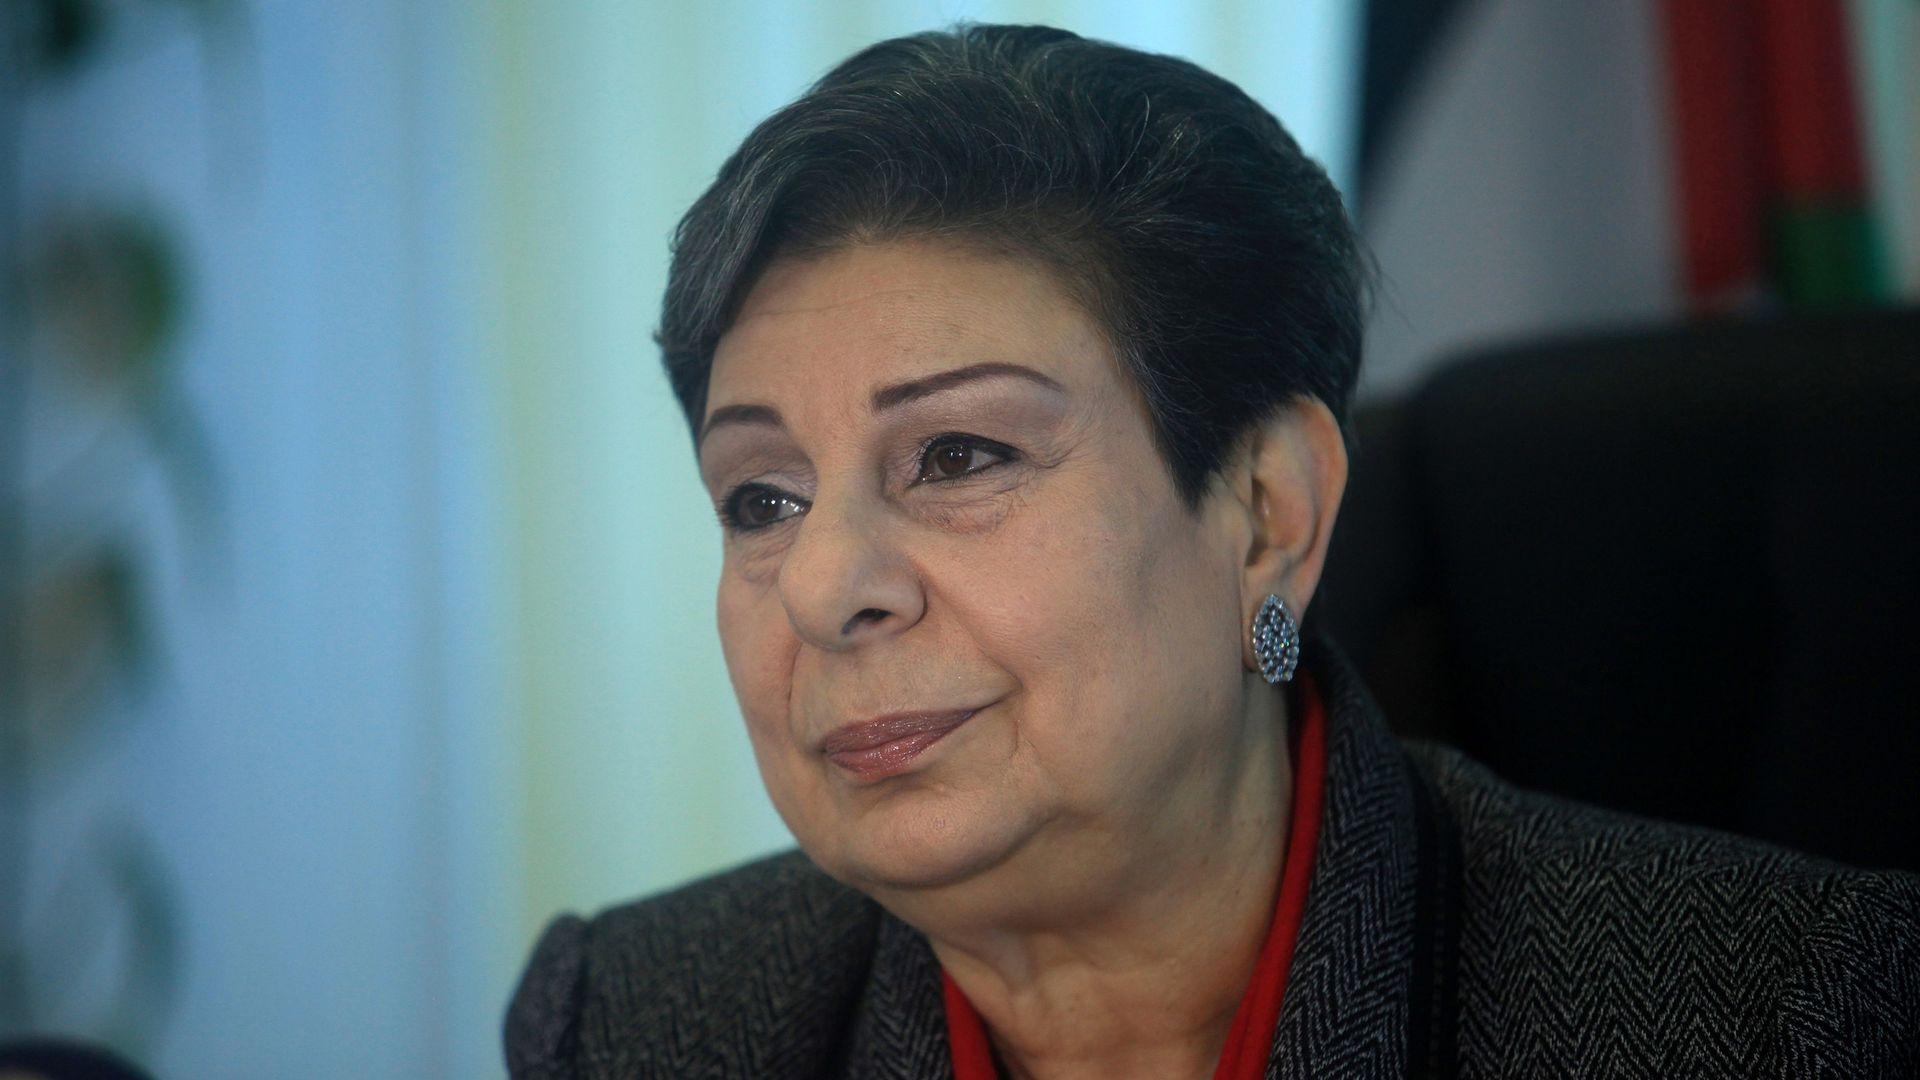 Senior Palestinian official denied entry to U.S.